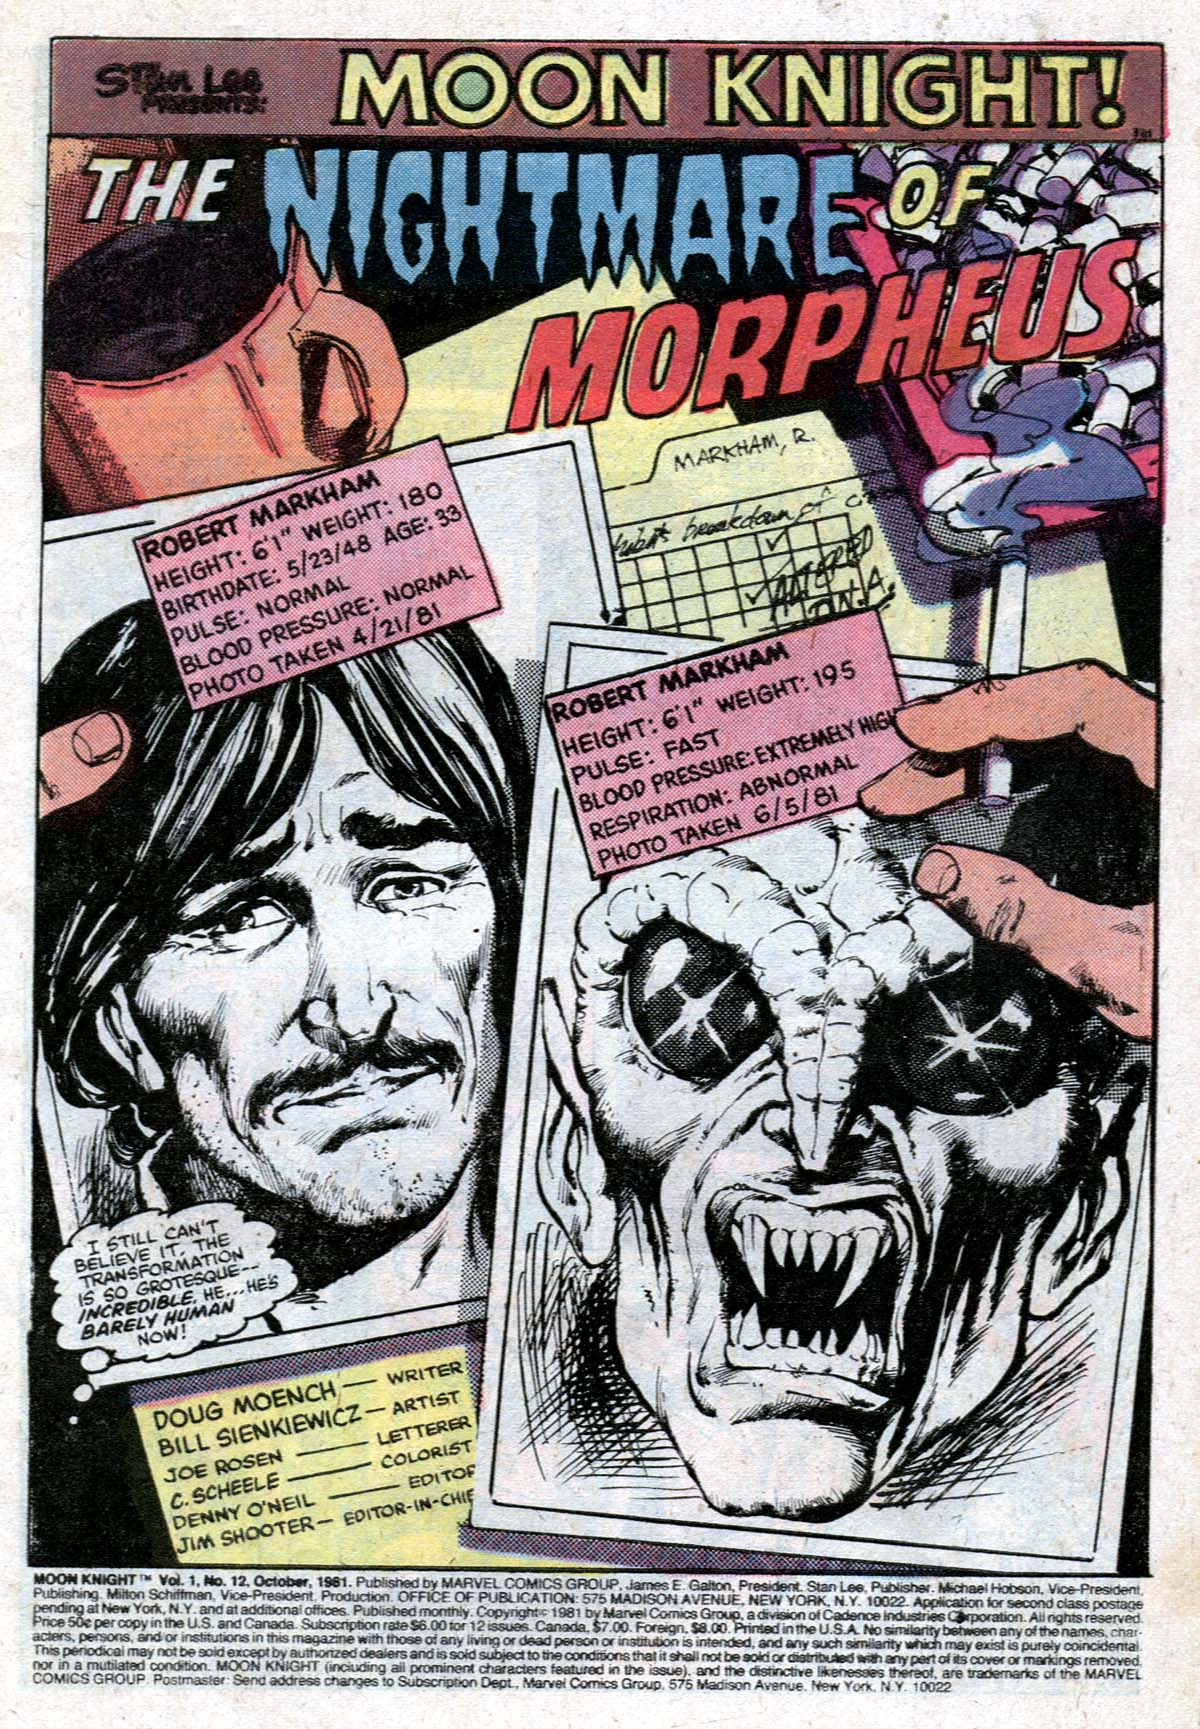 Morpheus from